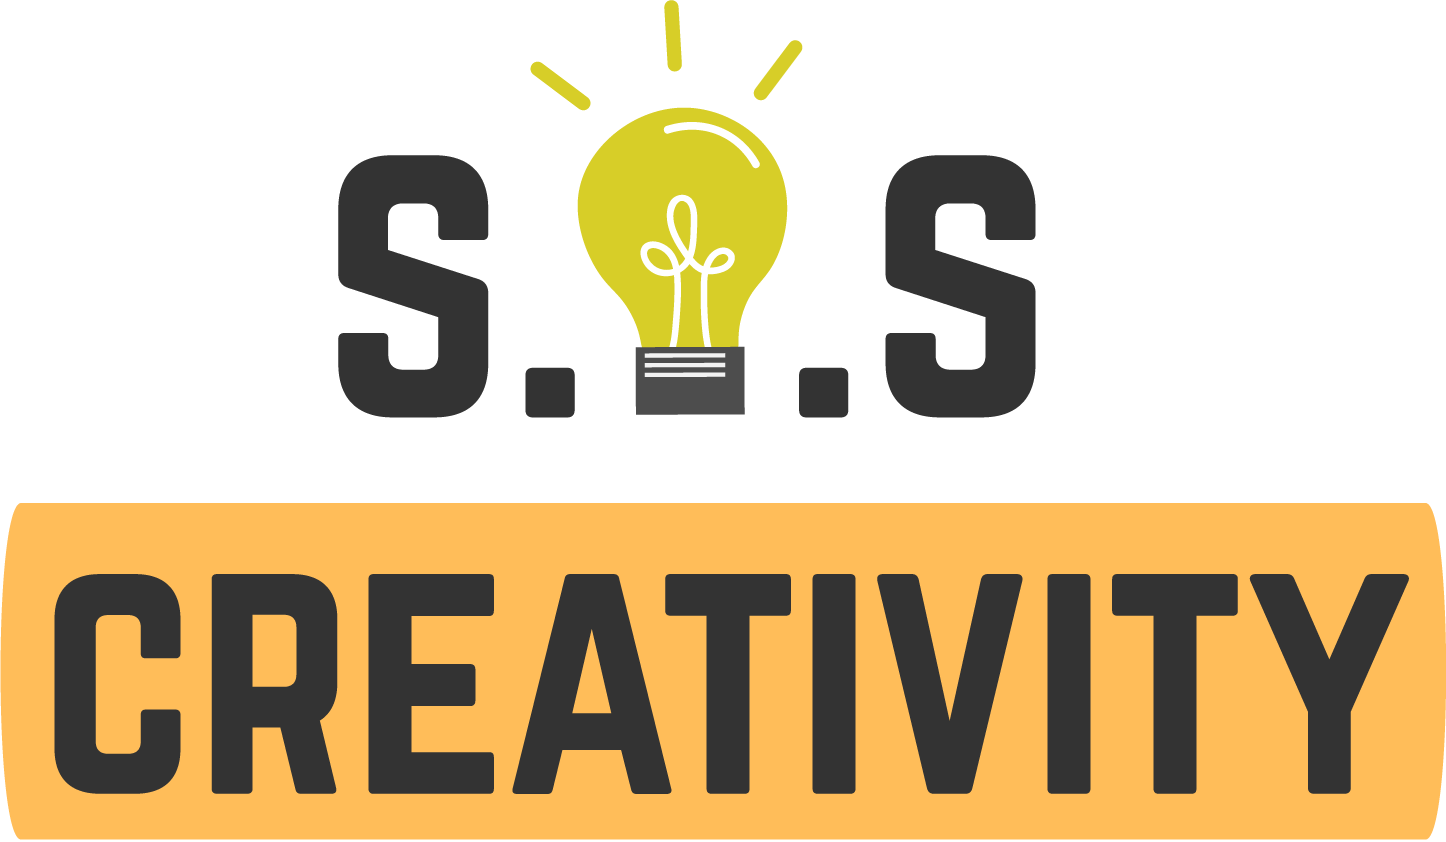 SOS Creativity